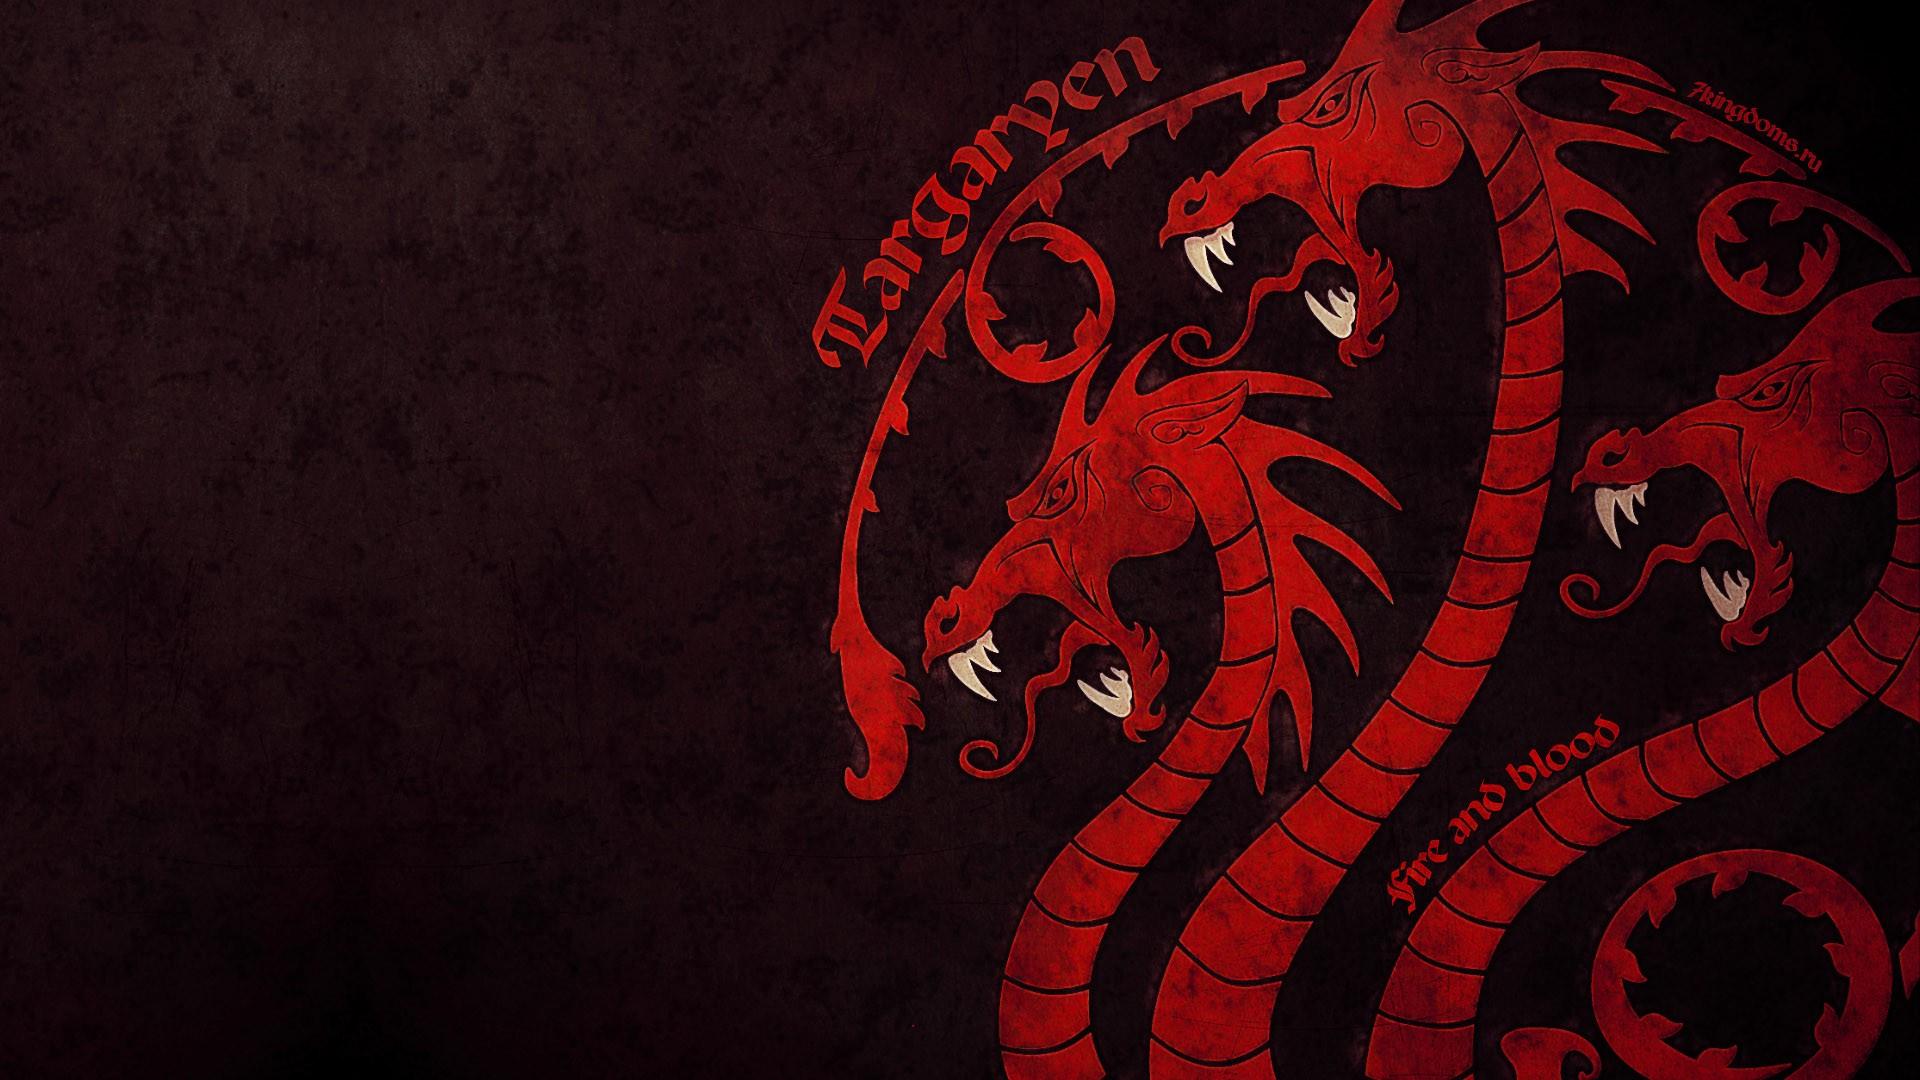 Game of Thrones House Targaryen   Wallpaper High Definition High 1920x1080